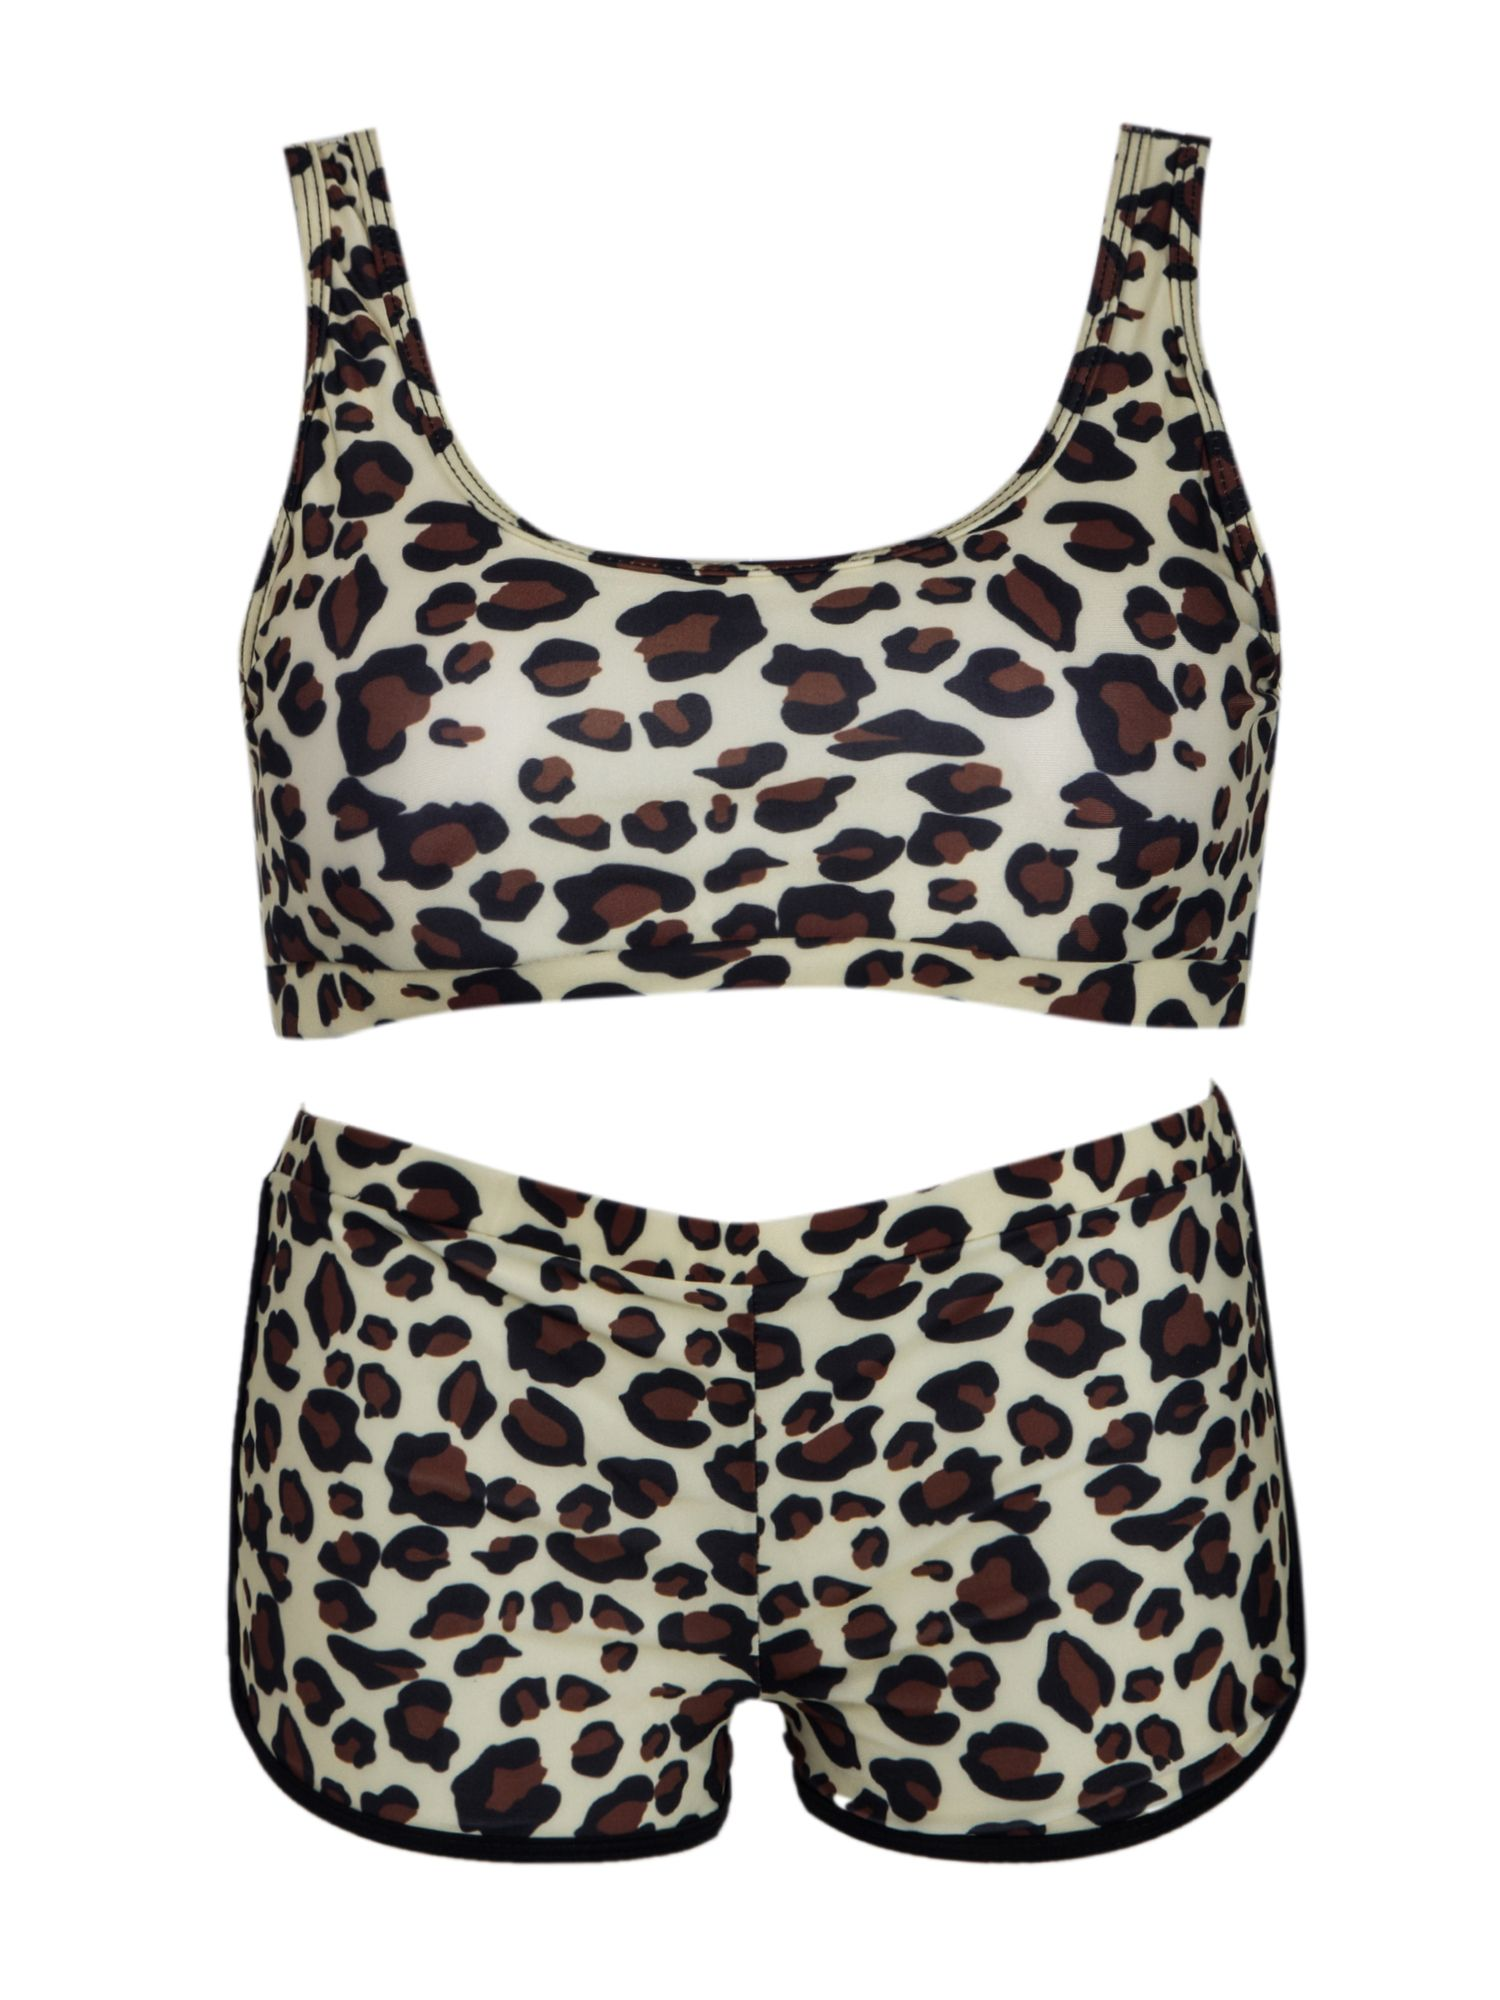 921d3cf96a09c SAYFUT Women's Two Piece Sports Padded Bra Bikini Set Swimsuit with Boy  Shorts Bathing Suits Leopard#Padded, #Bra, #Bikini